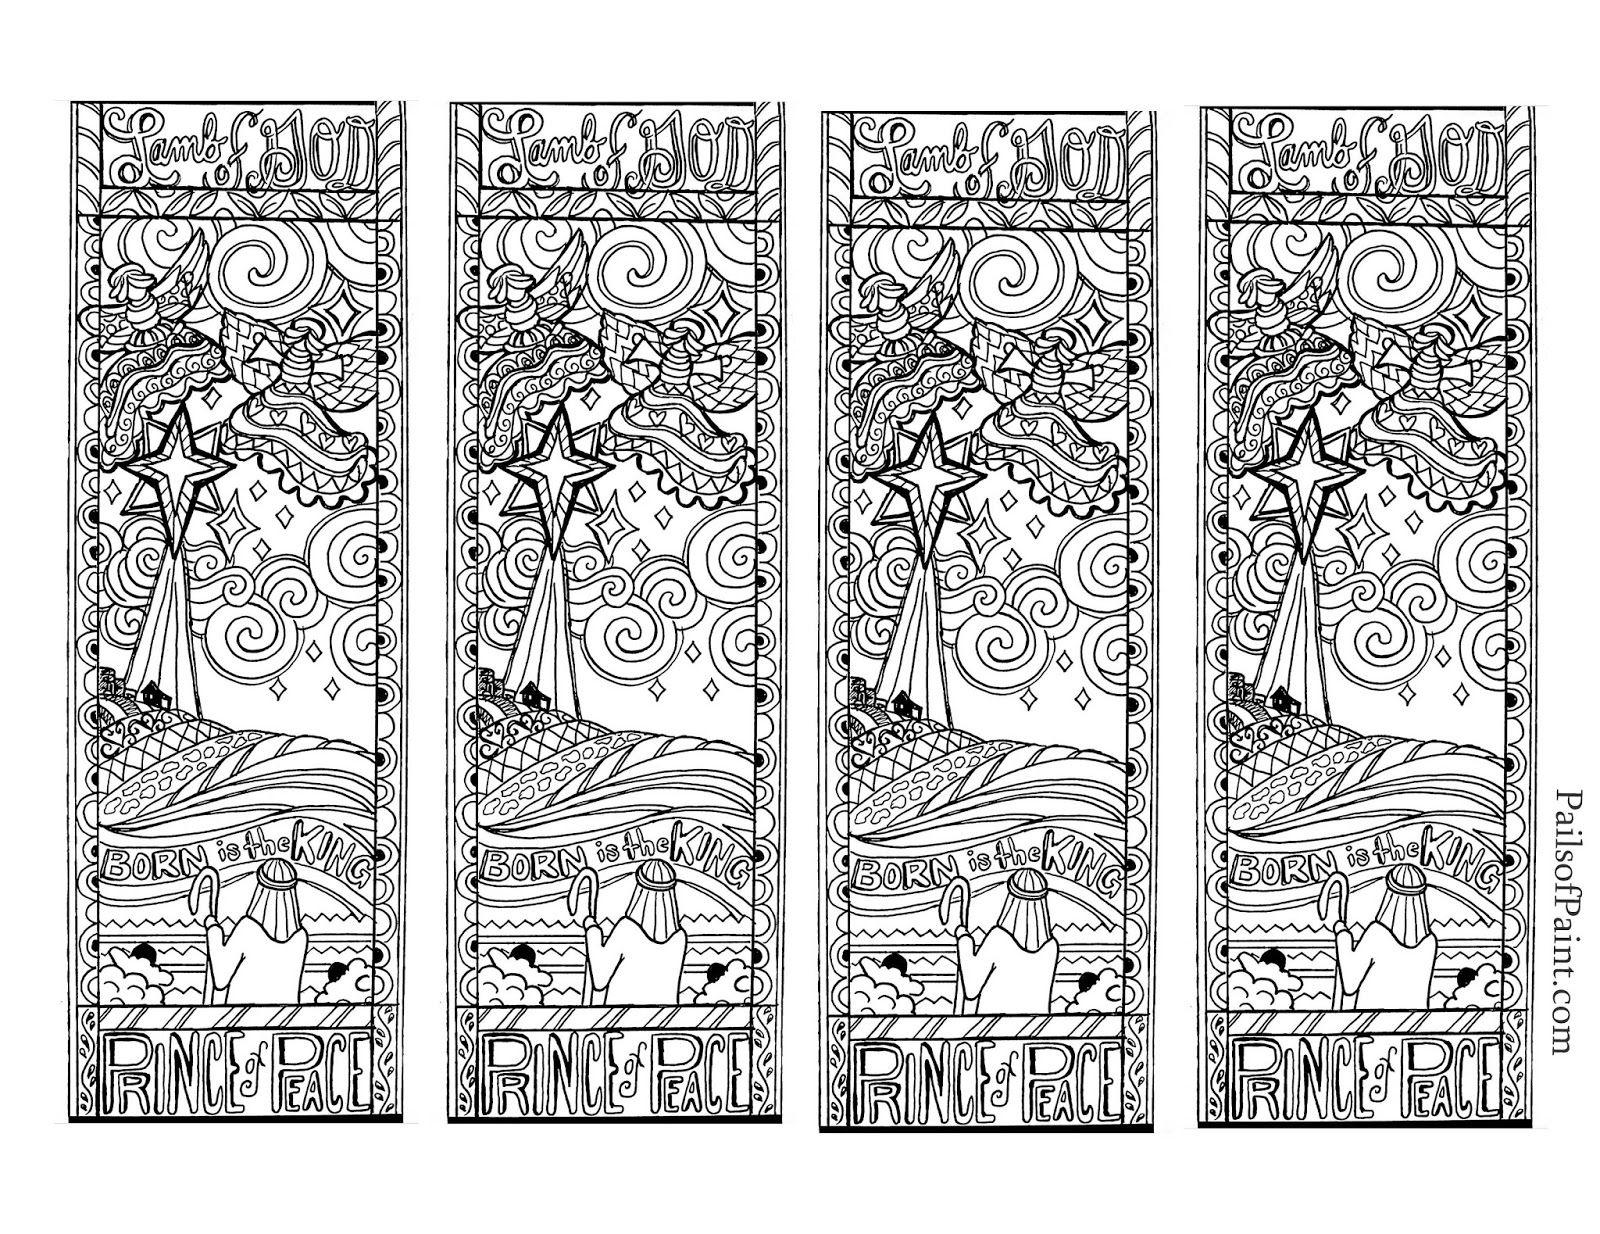 Free Printable Dragon Bookmarks To Color - Google Search | Buy It - Free Printable Dragon Bookmarks